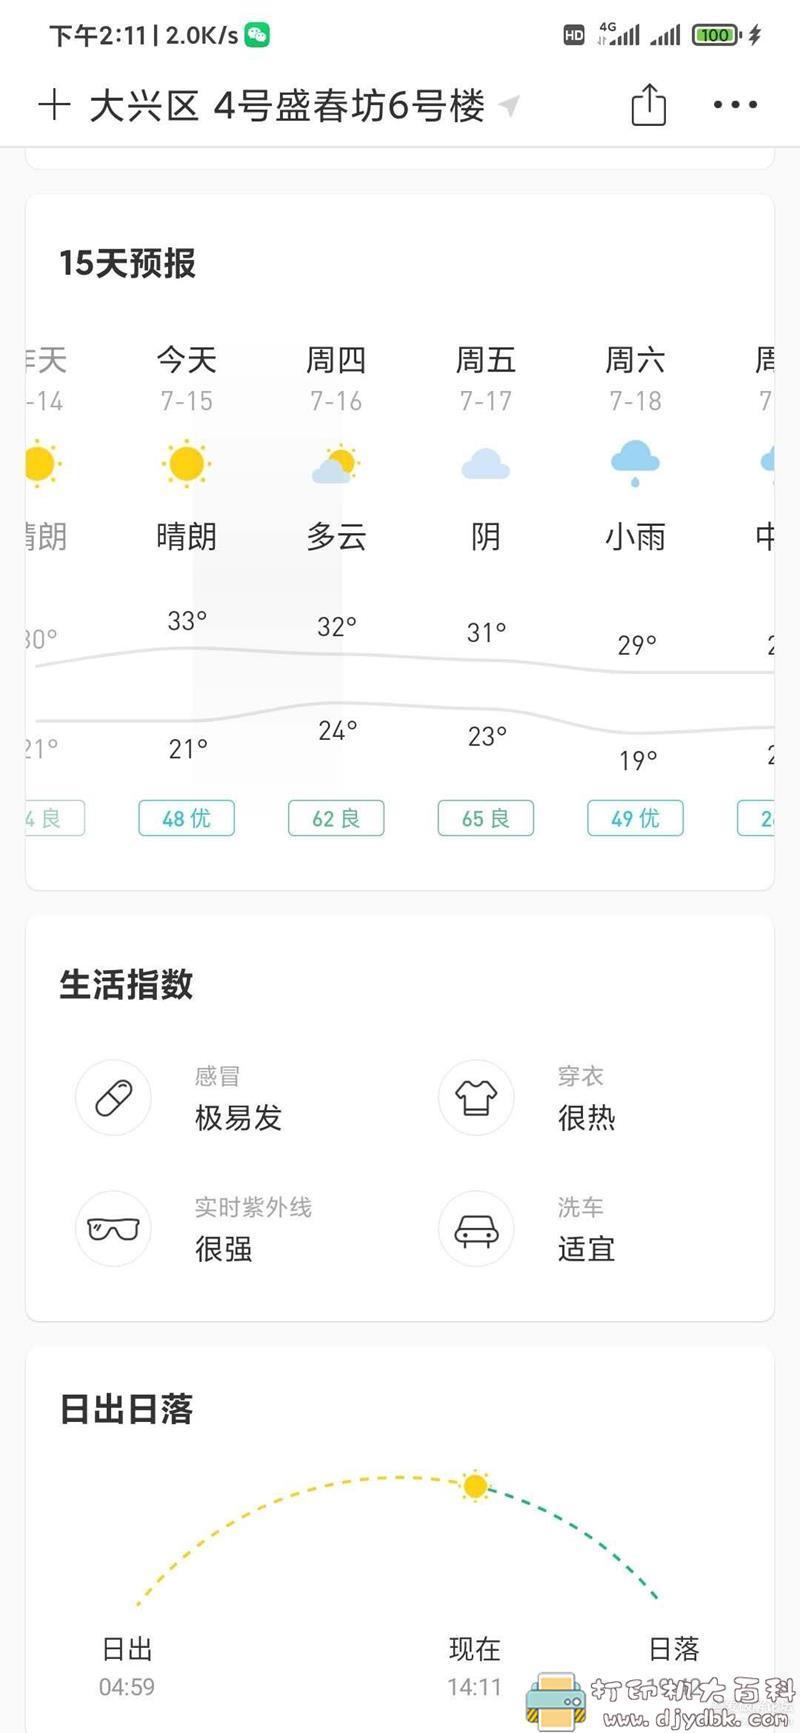 [Android]彩云天气V6.0.0 去广告VIP 精简版图片 No.3